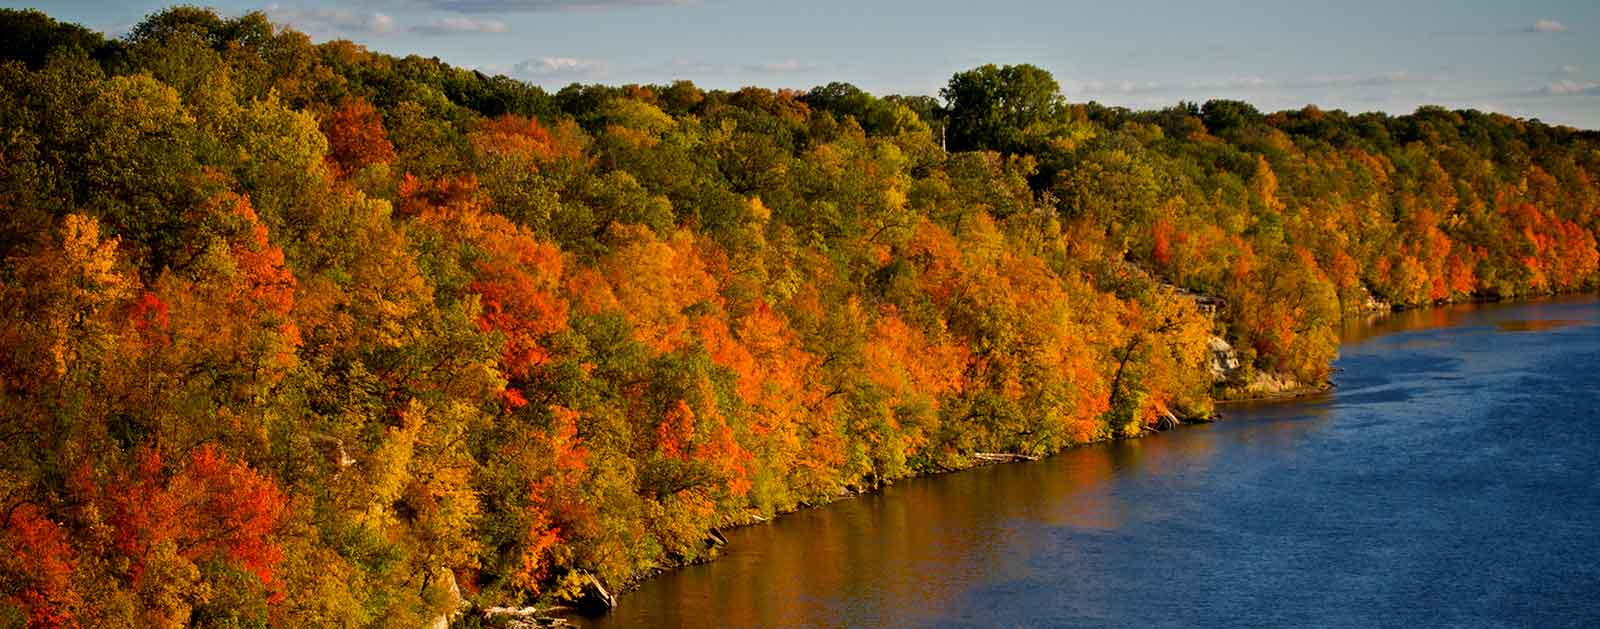 Image Source: American Rivers